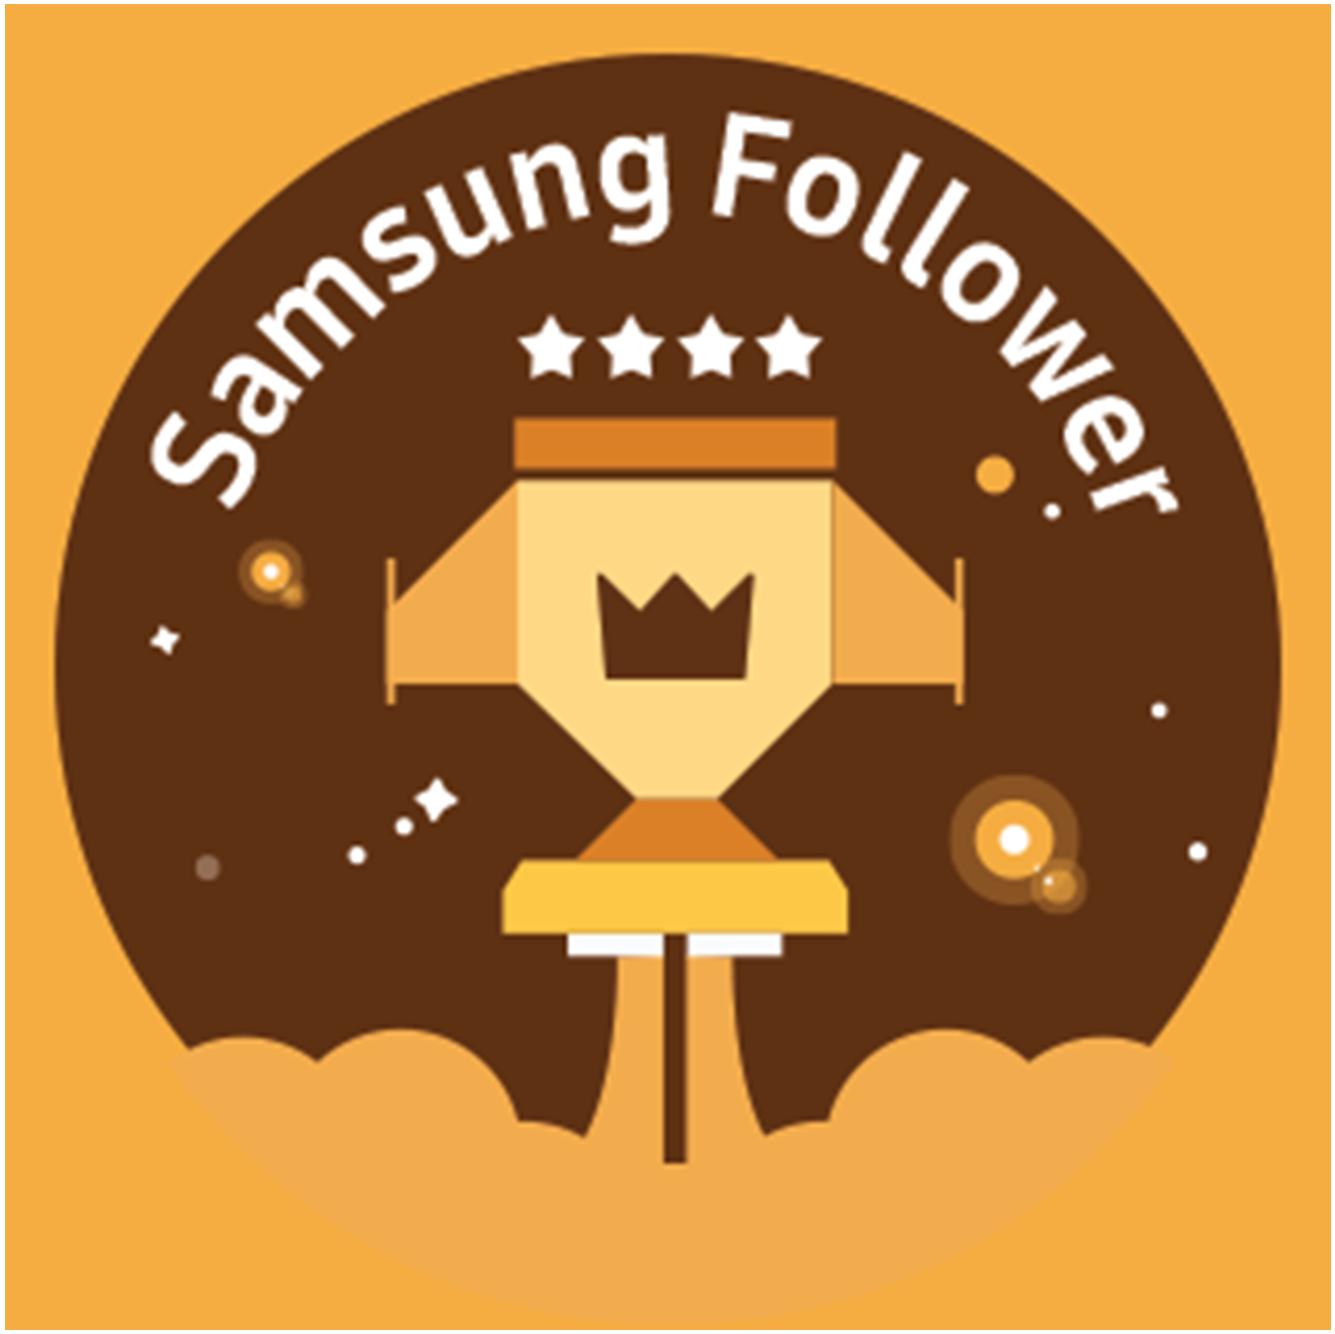 Samsung Follower